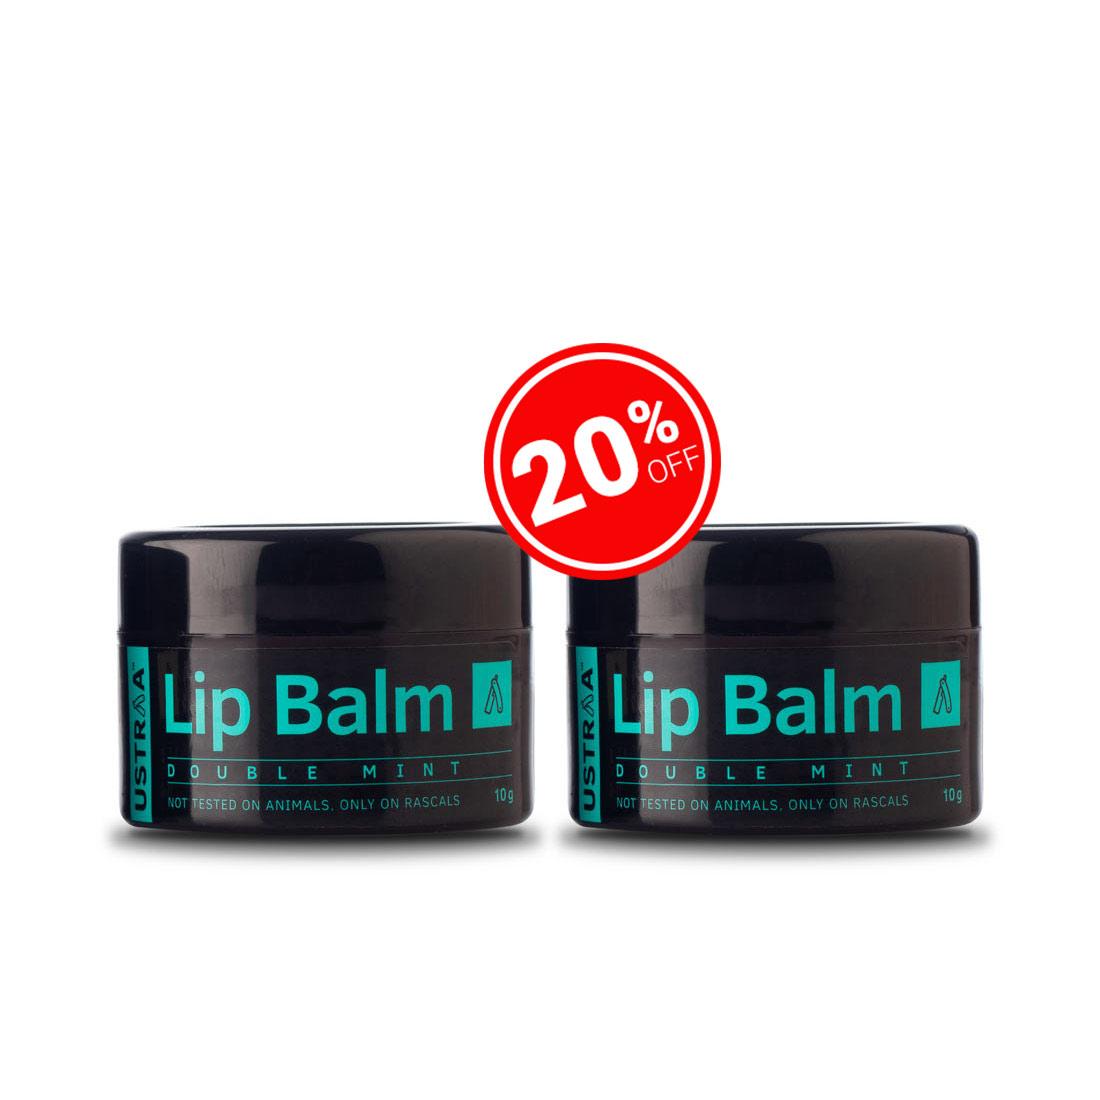 Ustraa Lip Balm (Double Mint) - Set of 2 (10g)